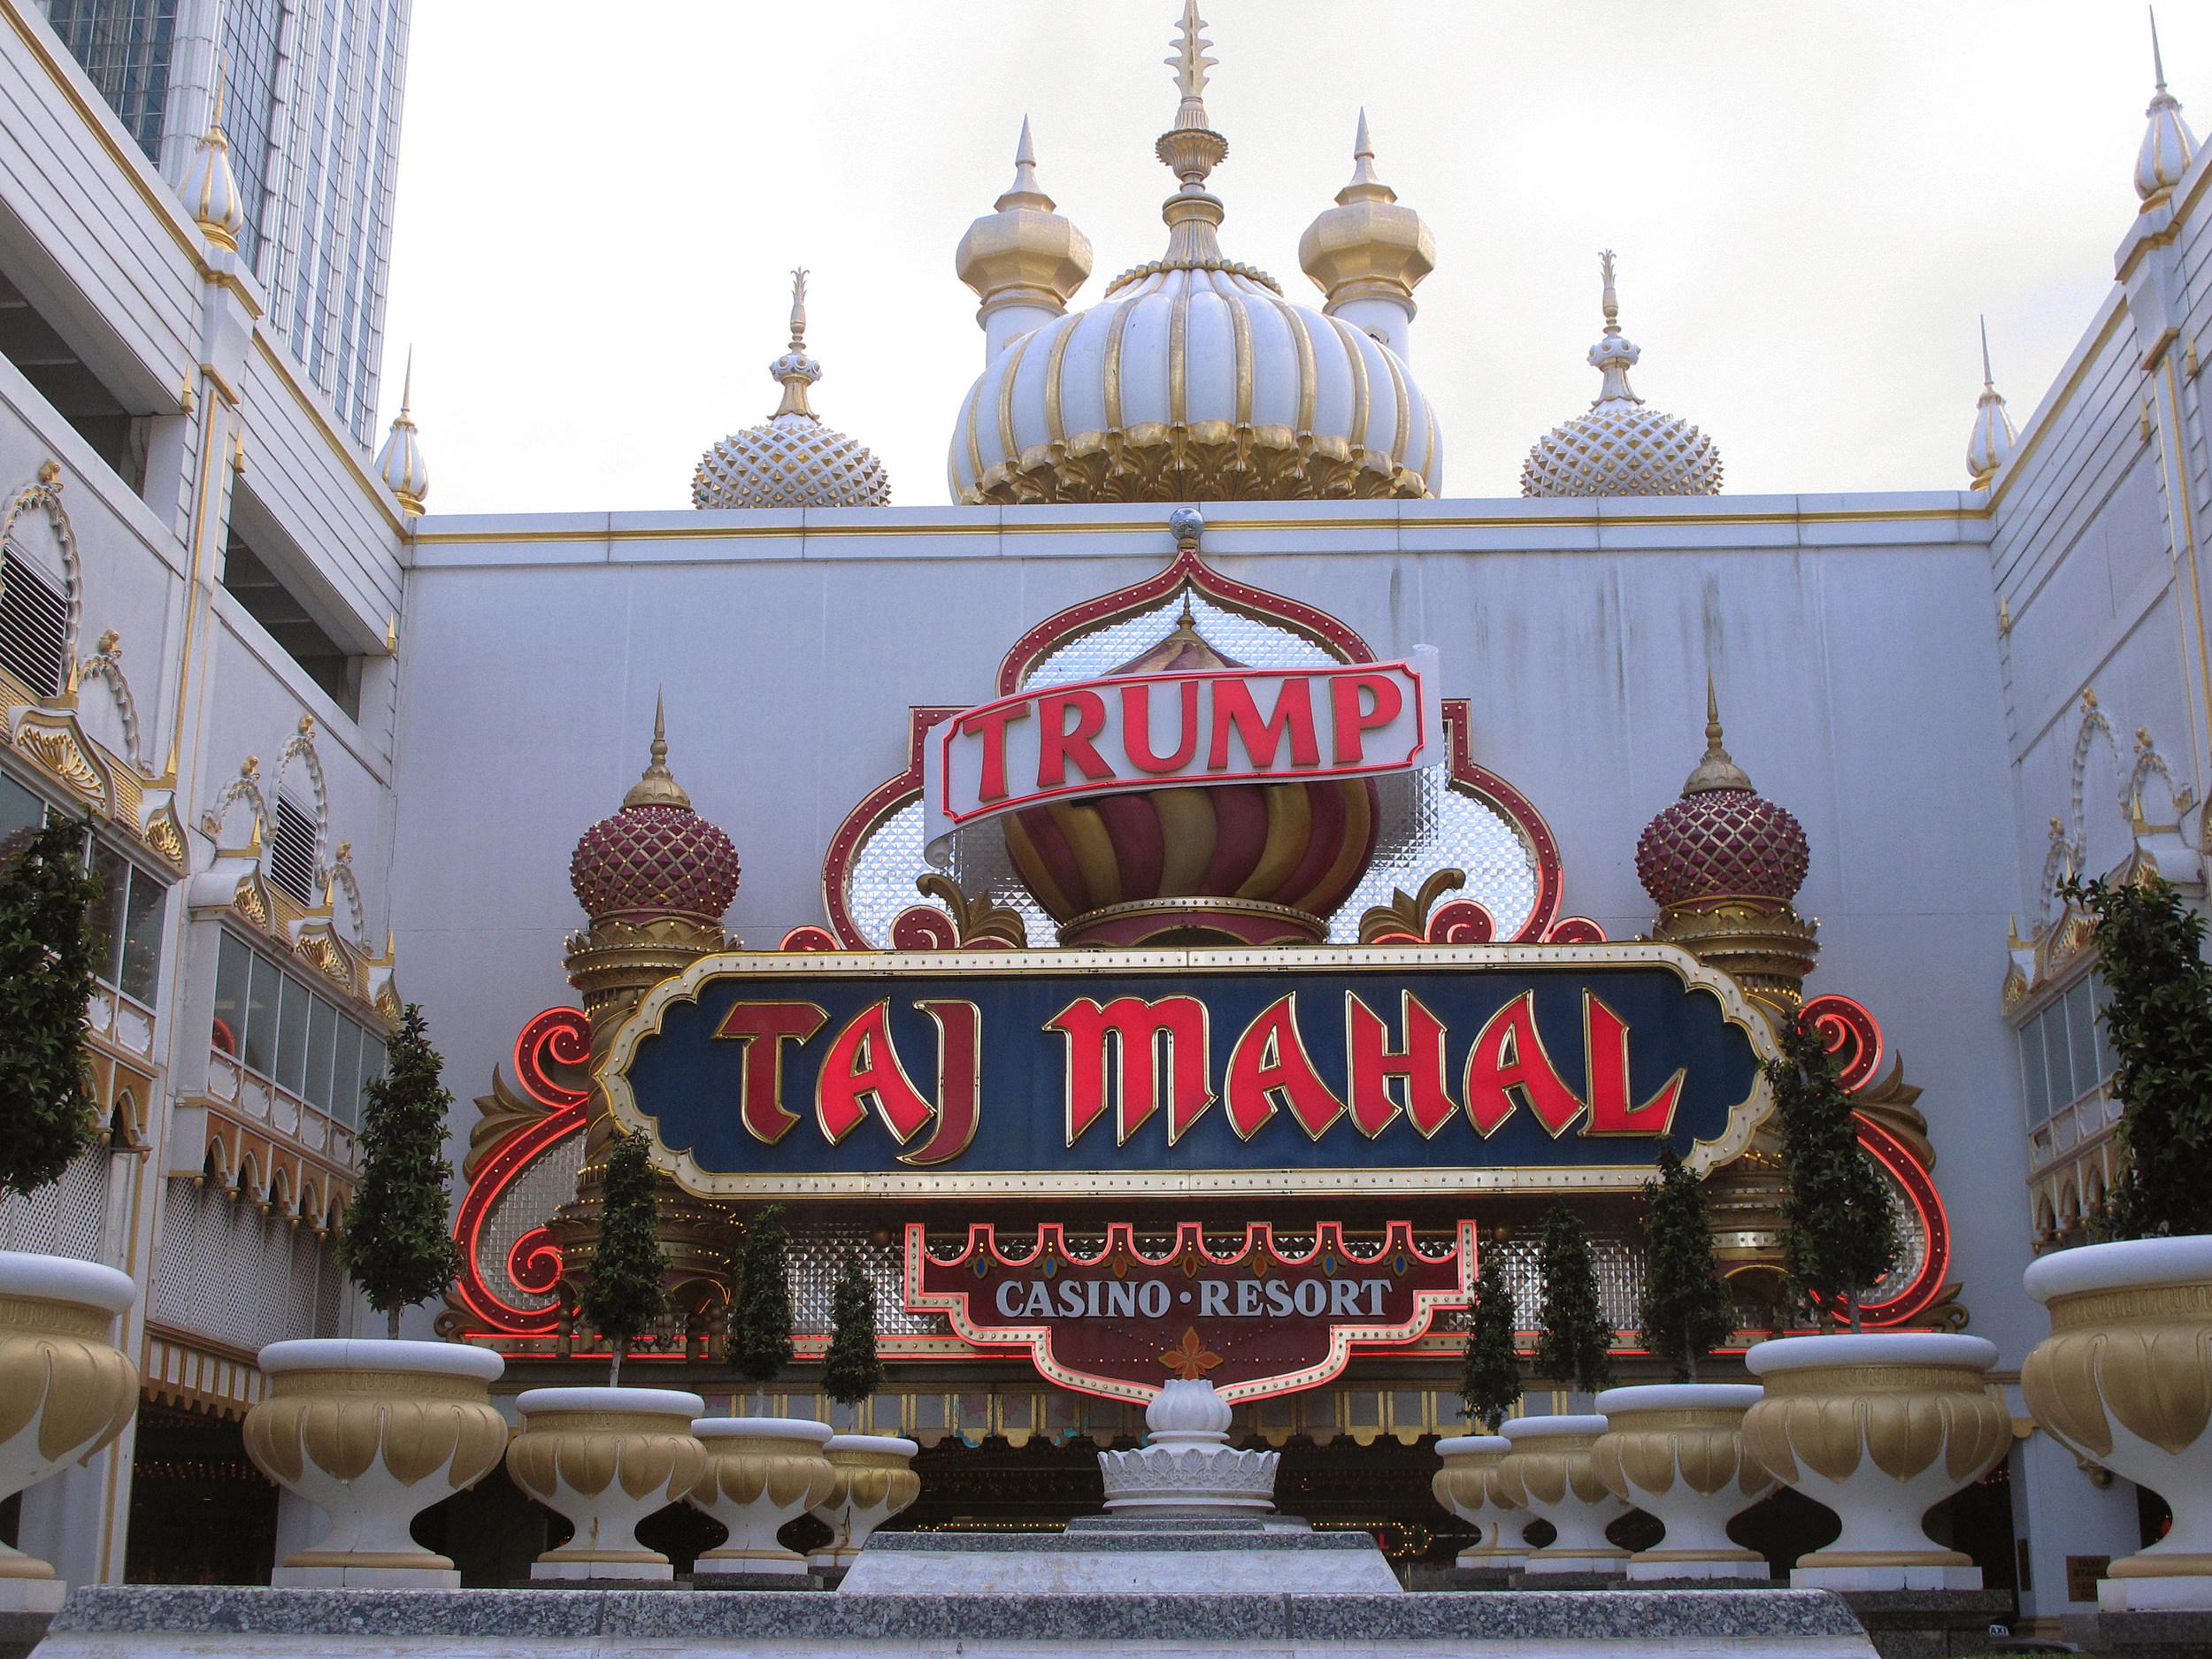 Trump taj mahal casino resort atlantic city nj double down casino free chips links